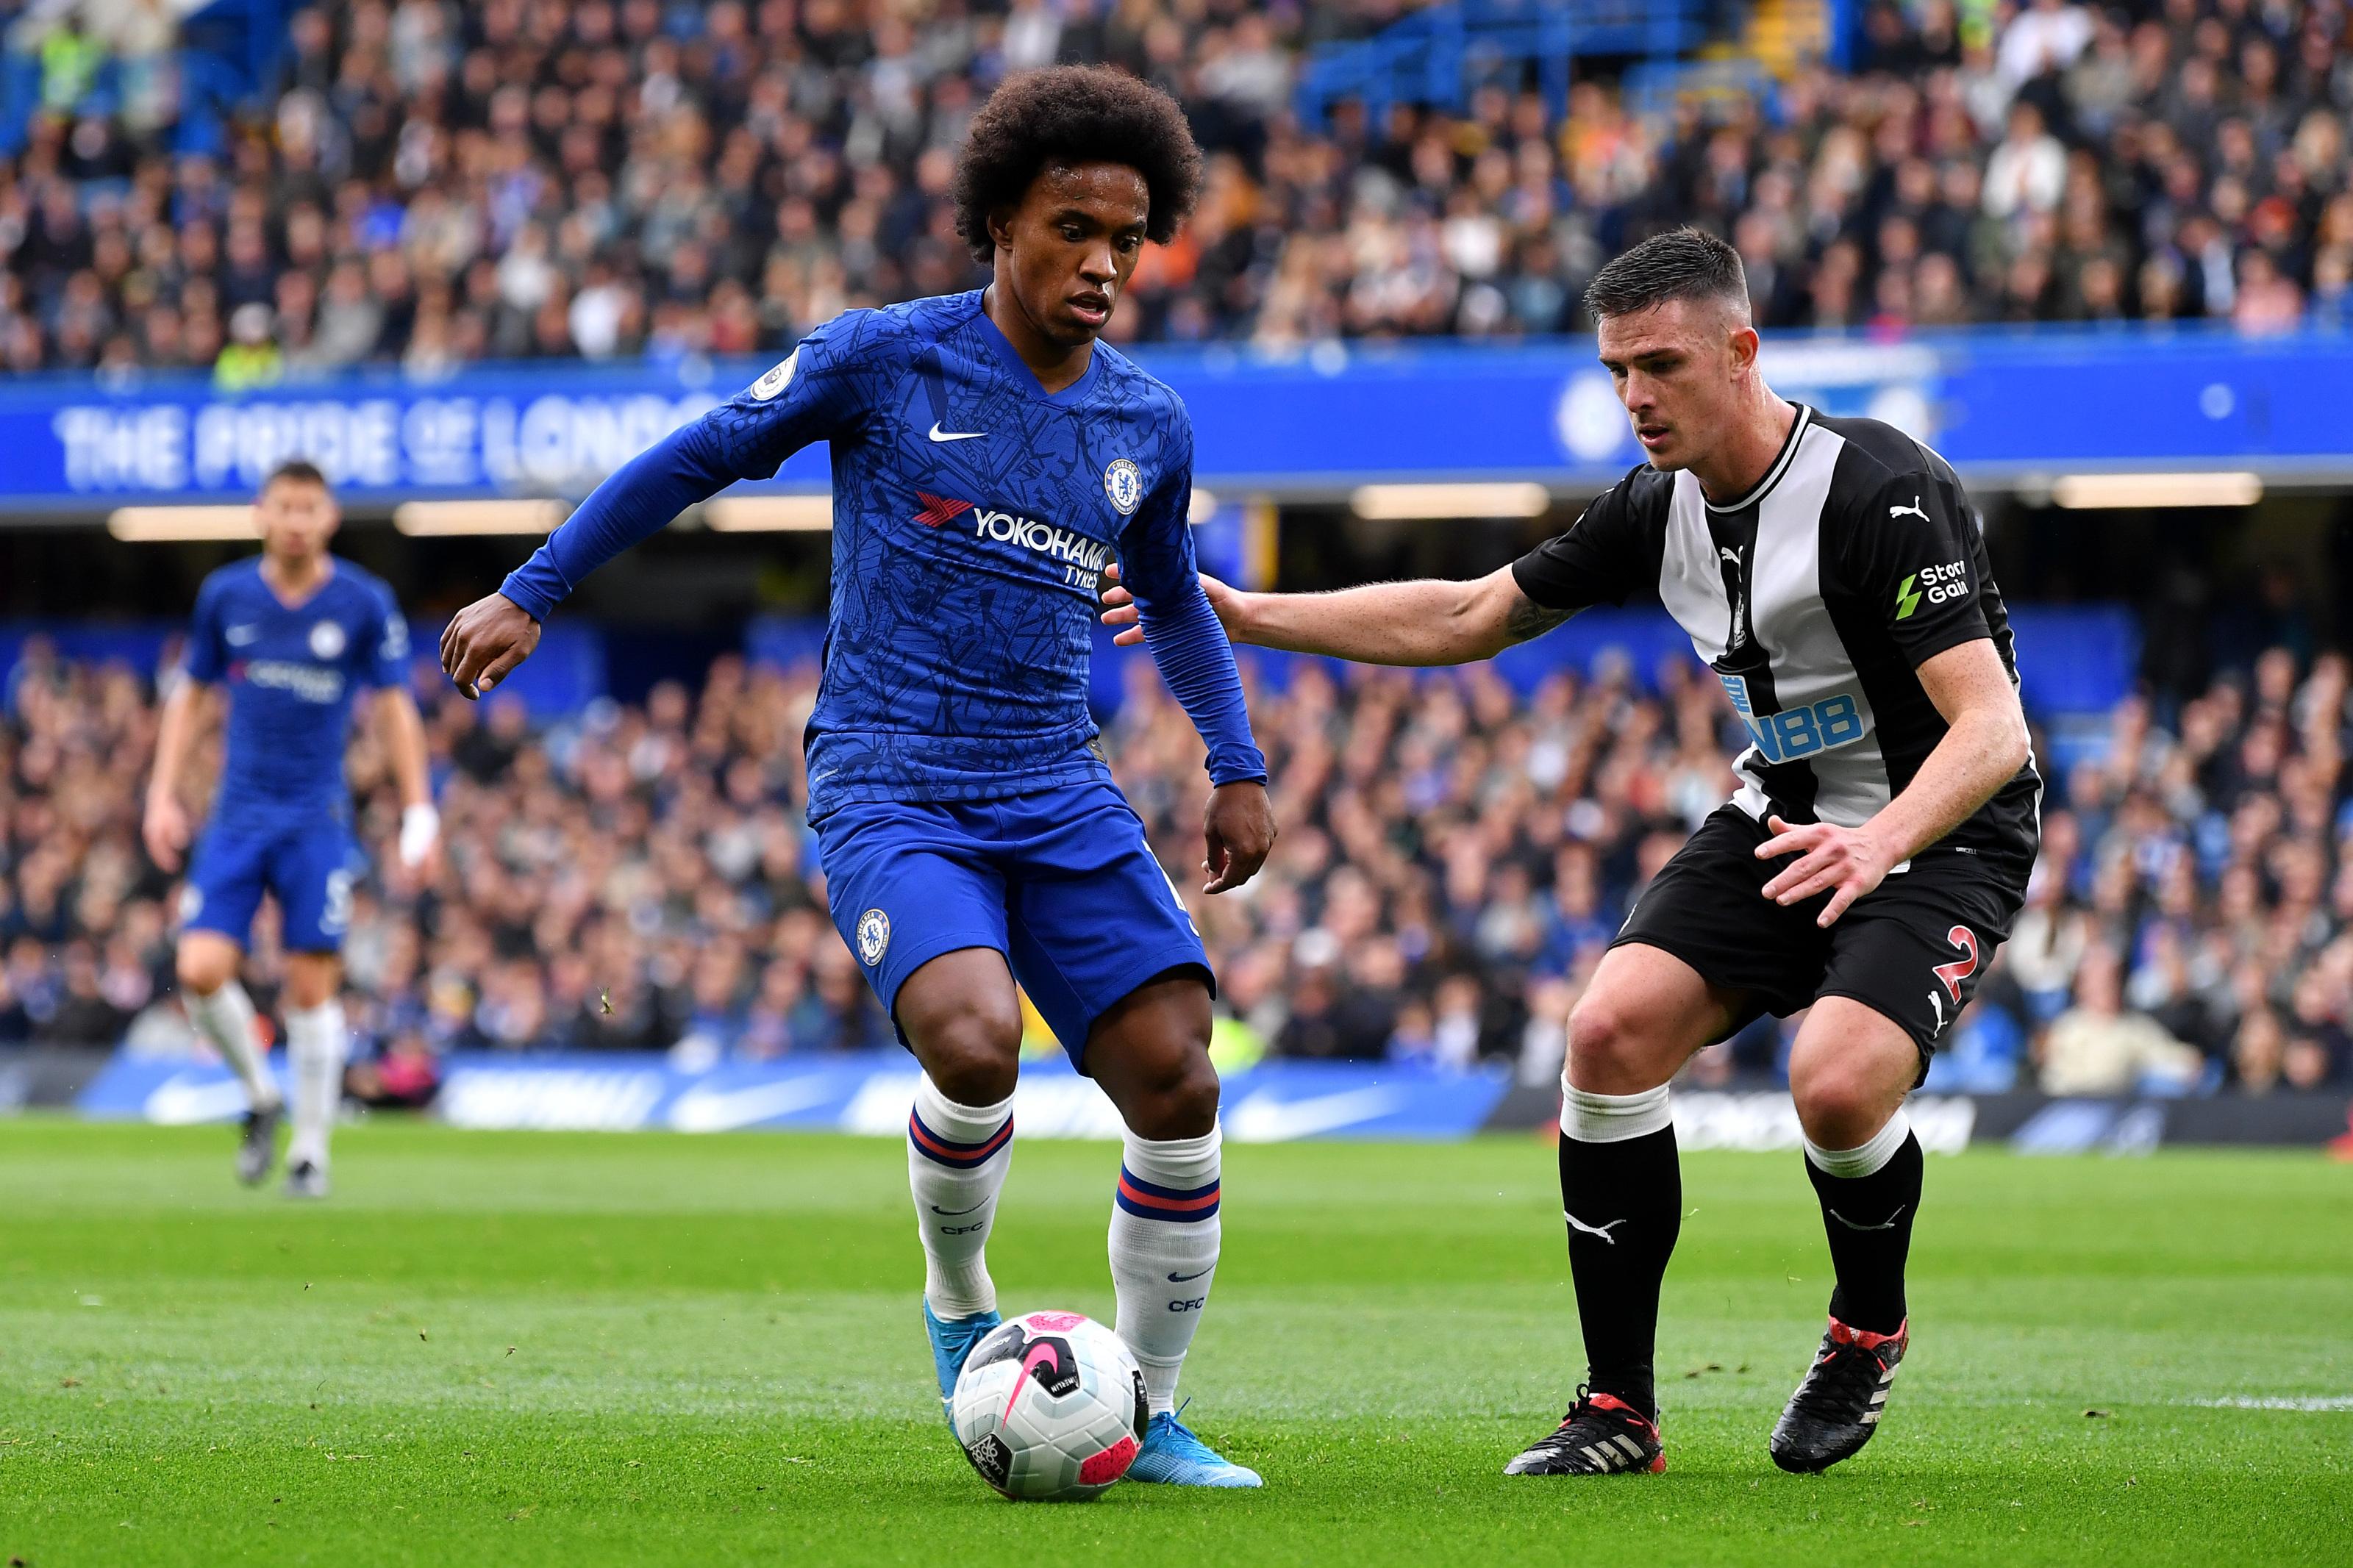 Chelsea: Willian's contract situation echoes David Luiz's